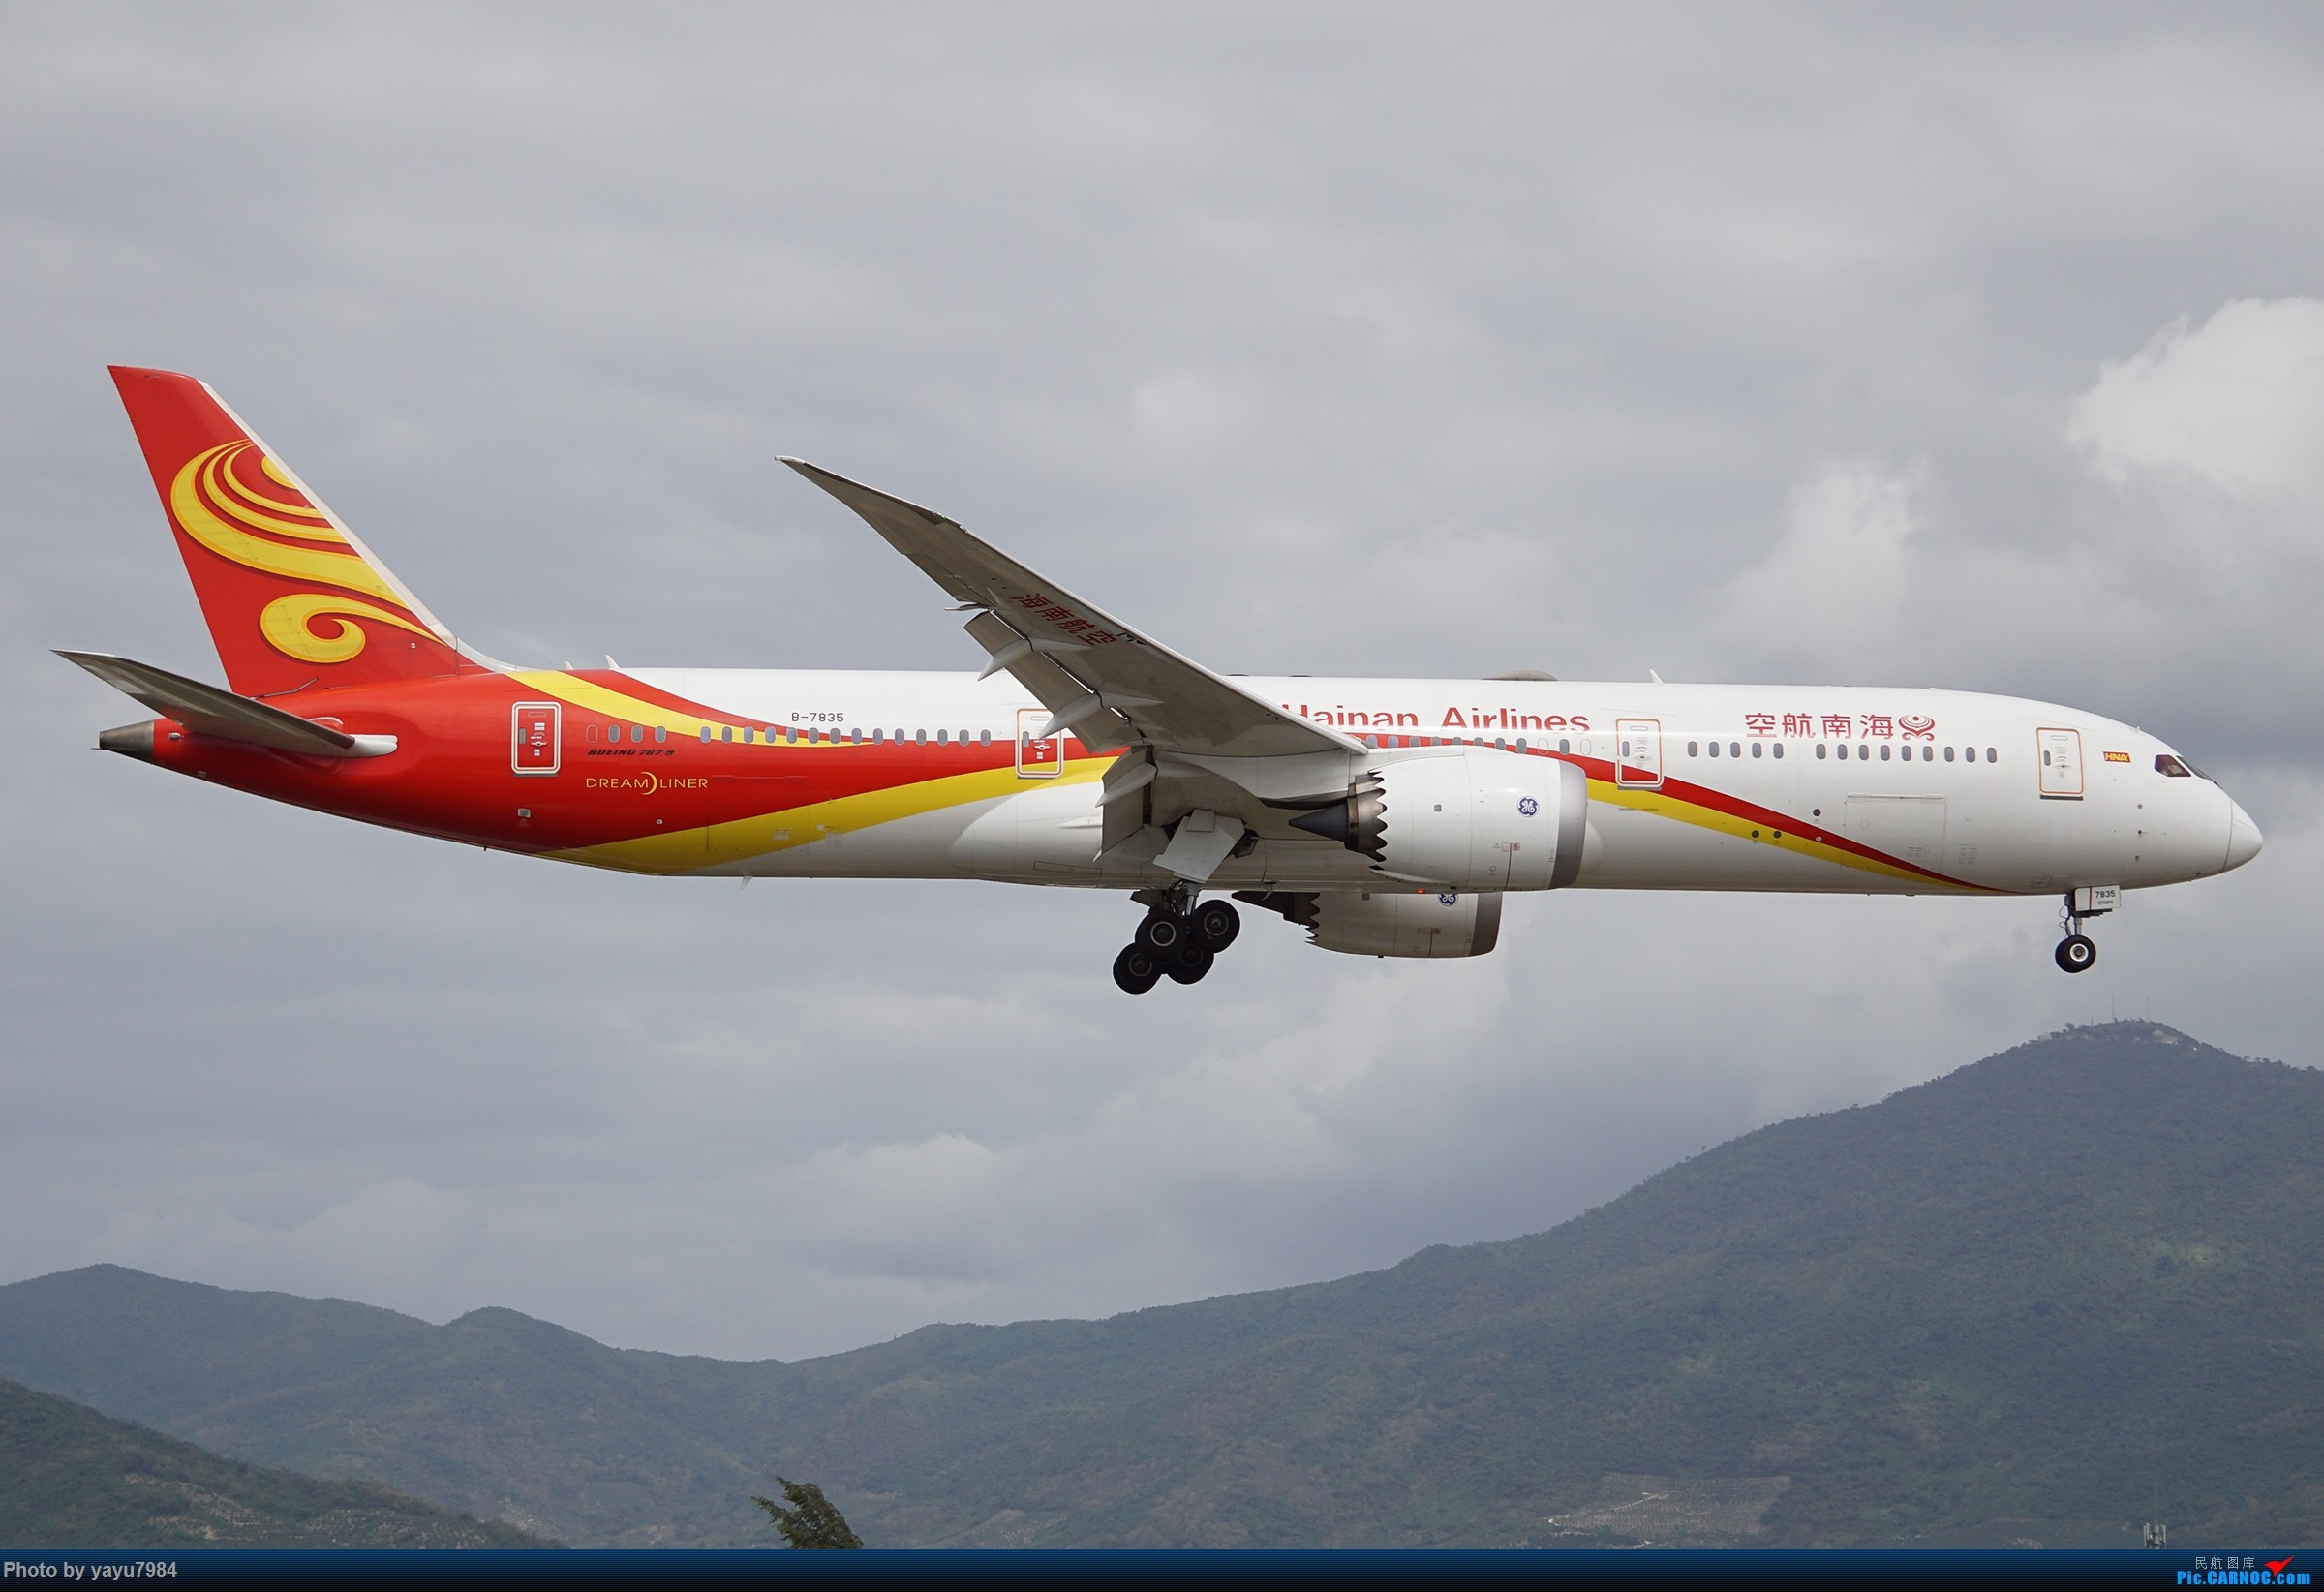 Re:[原创][SYX] 回国首拍,春运高峰时段的三亚凤凰国际机场 BOEING 787-9 B-7835 中国三亚凤凰国际机场